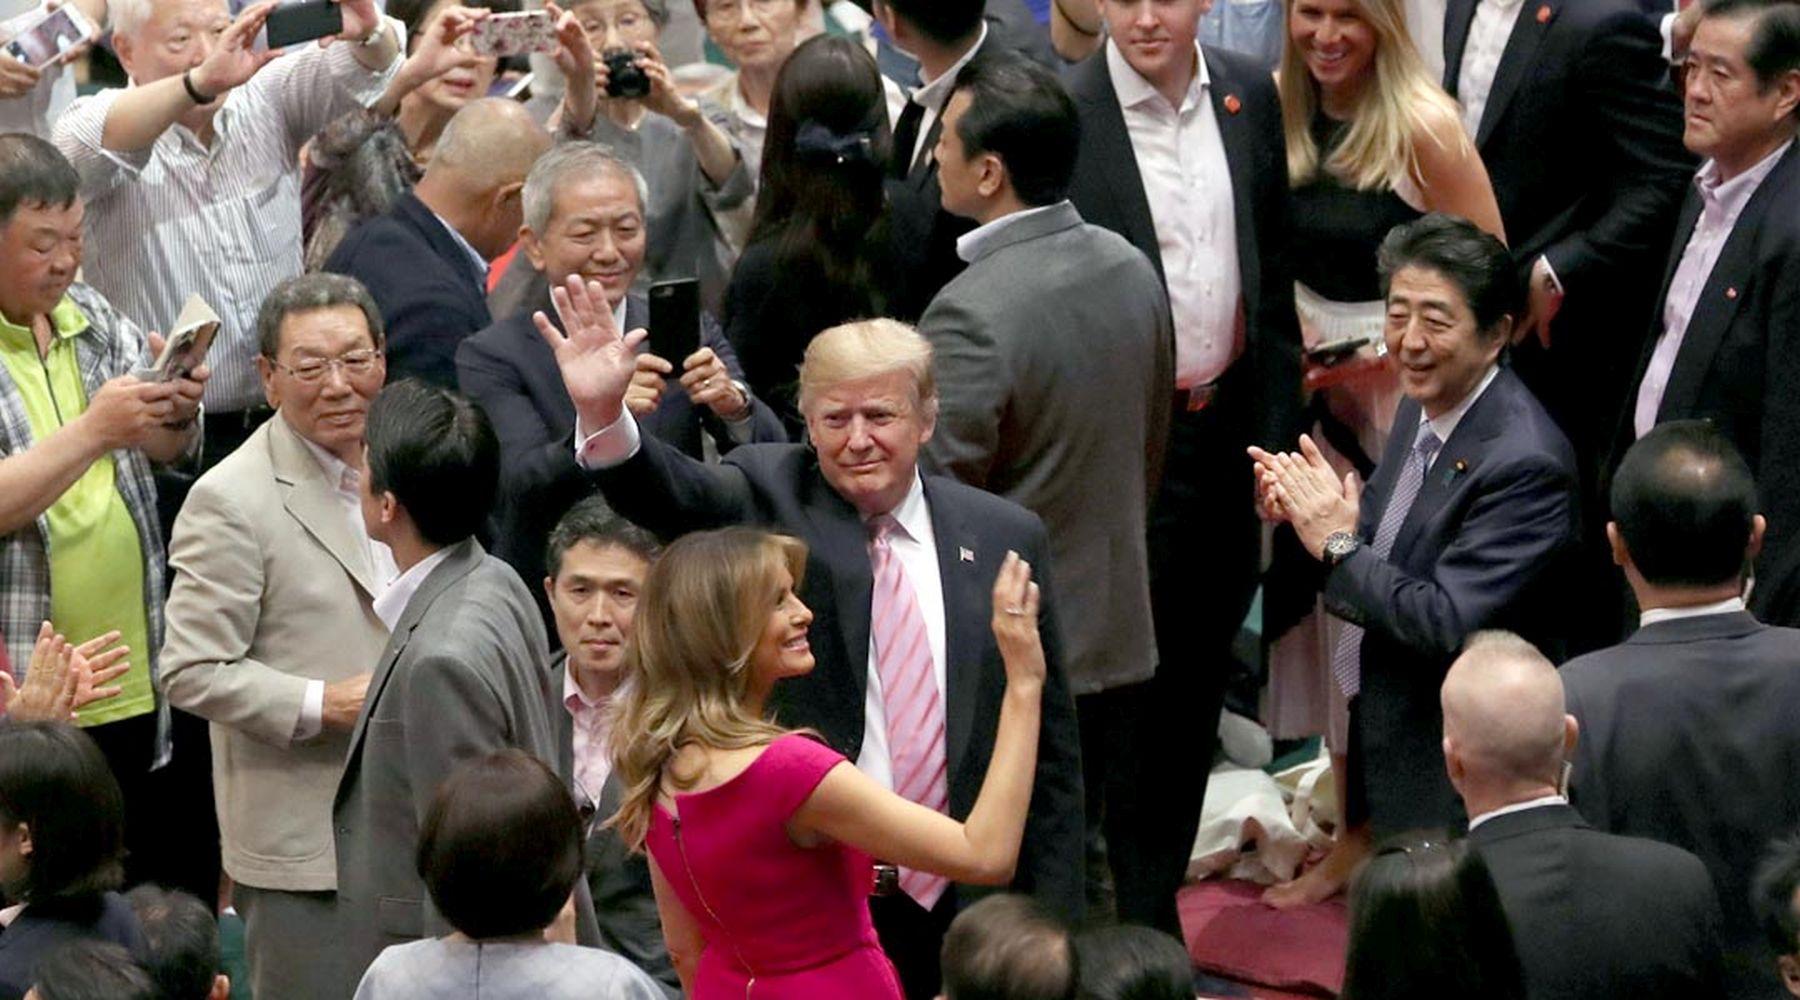 President Trump U.S. Cup to Japan Sumo Wrestler 001